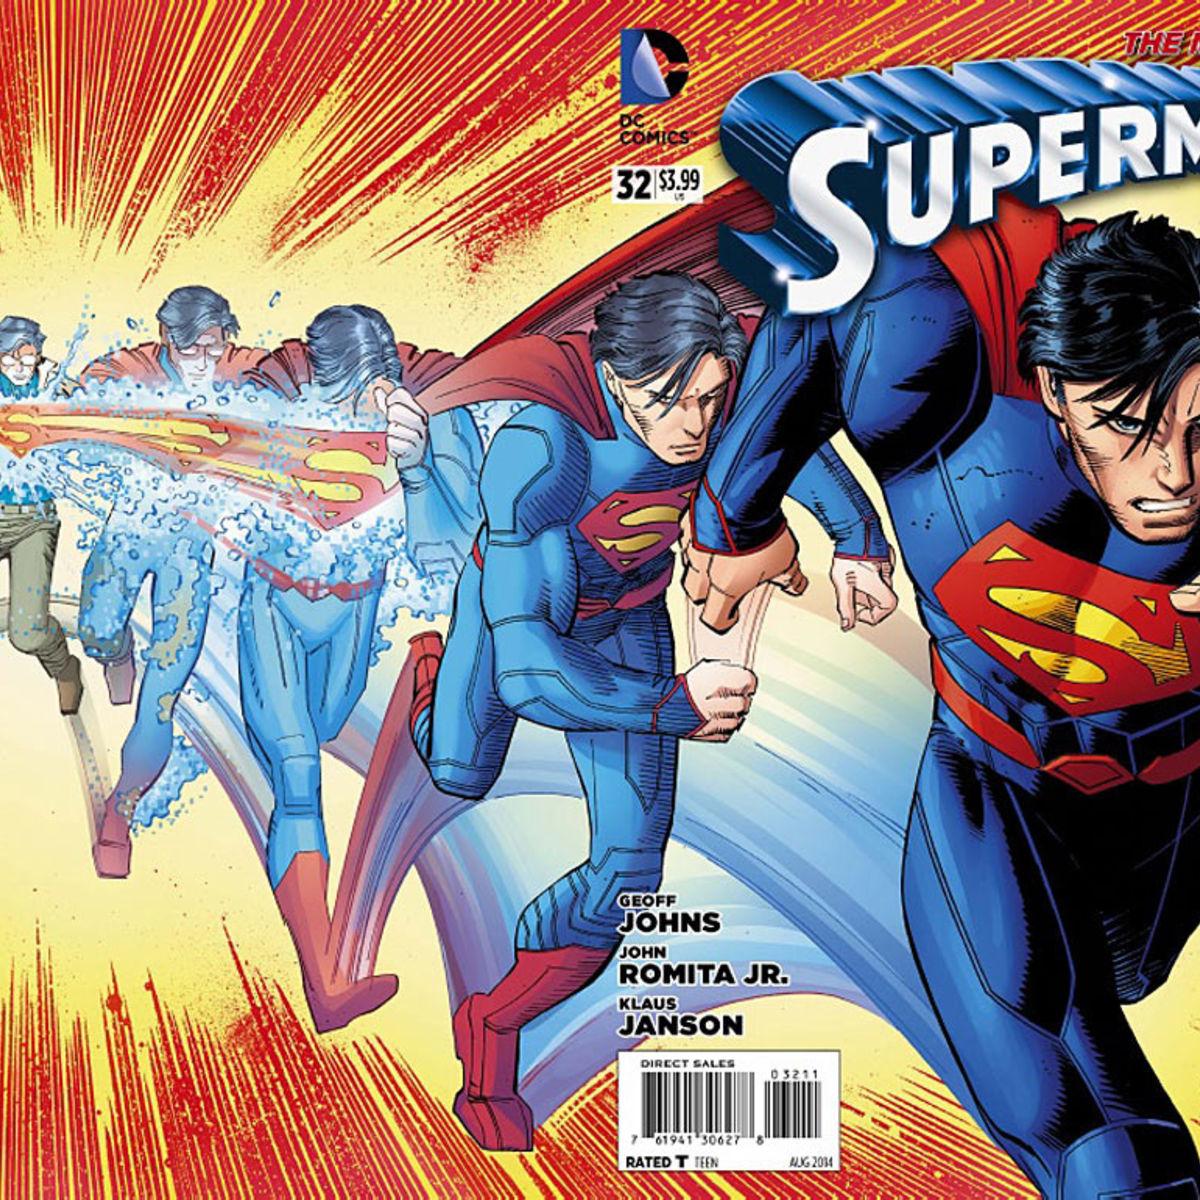 08-superman32.jpg